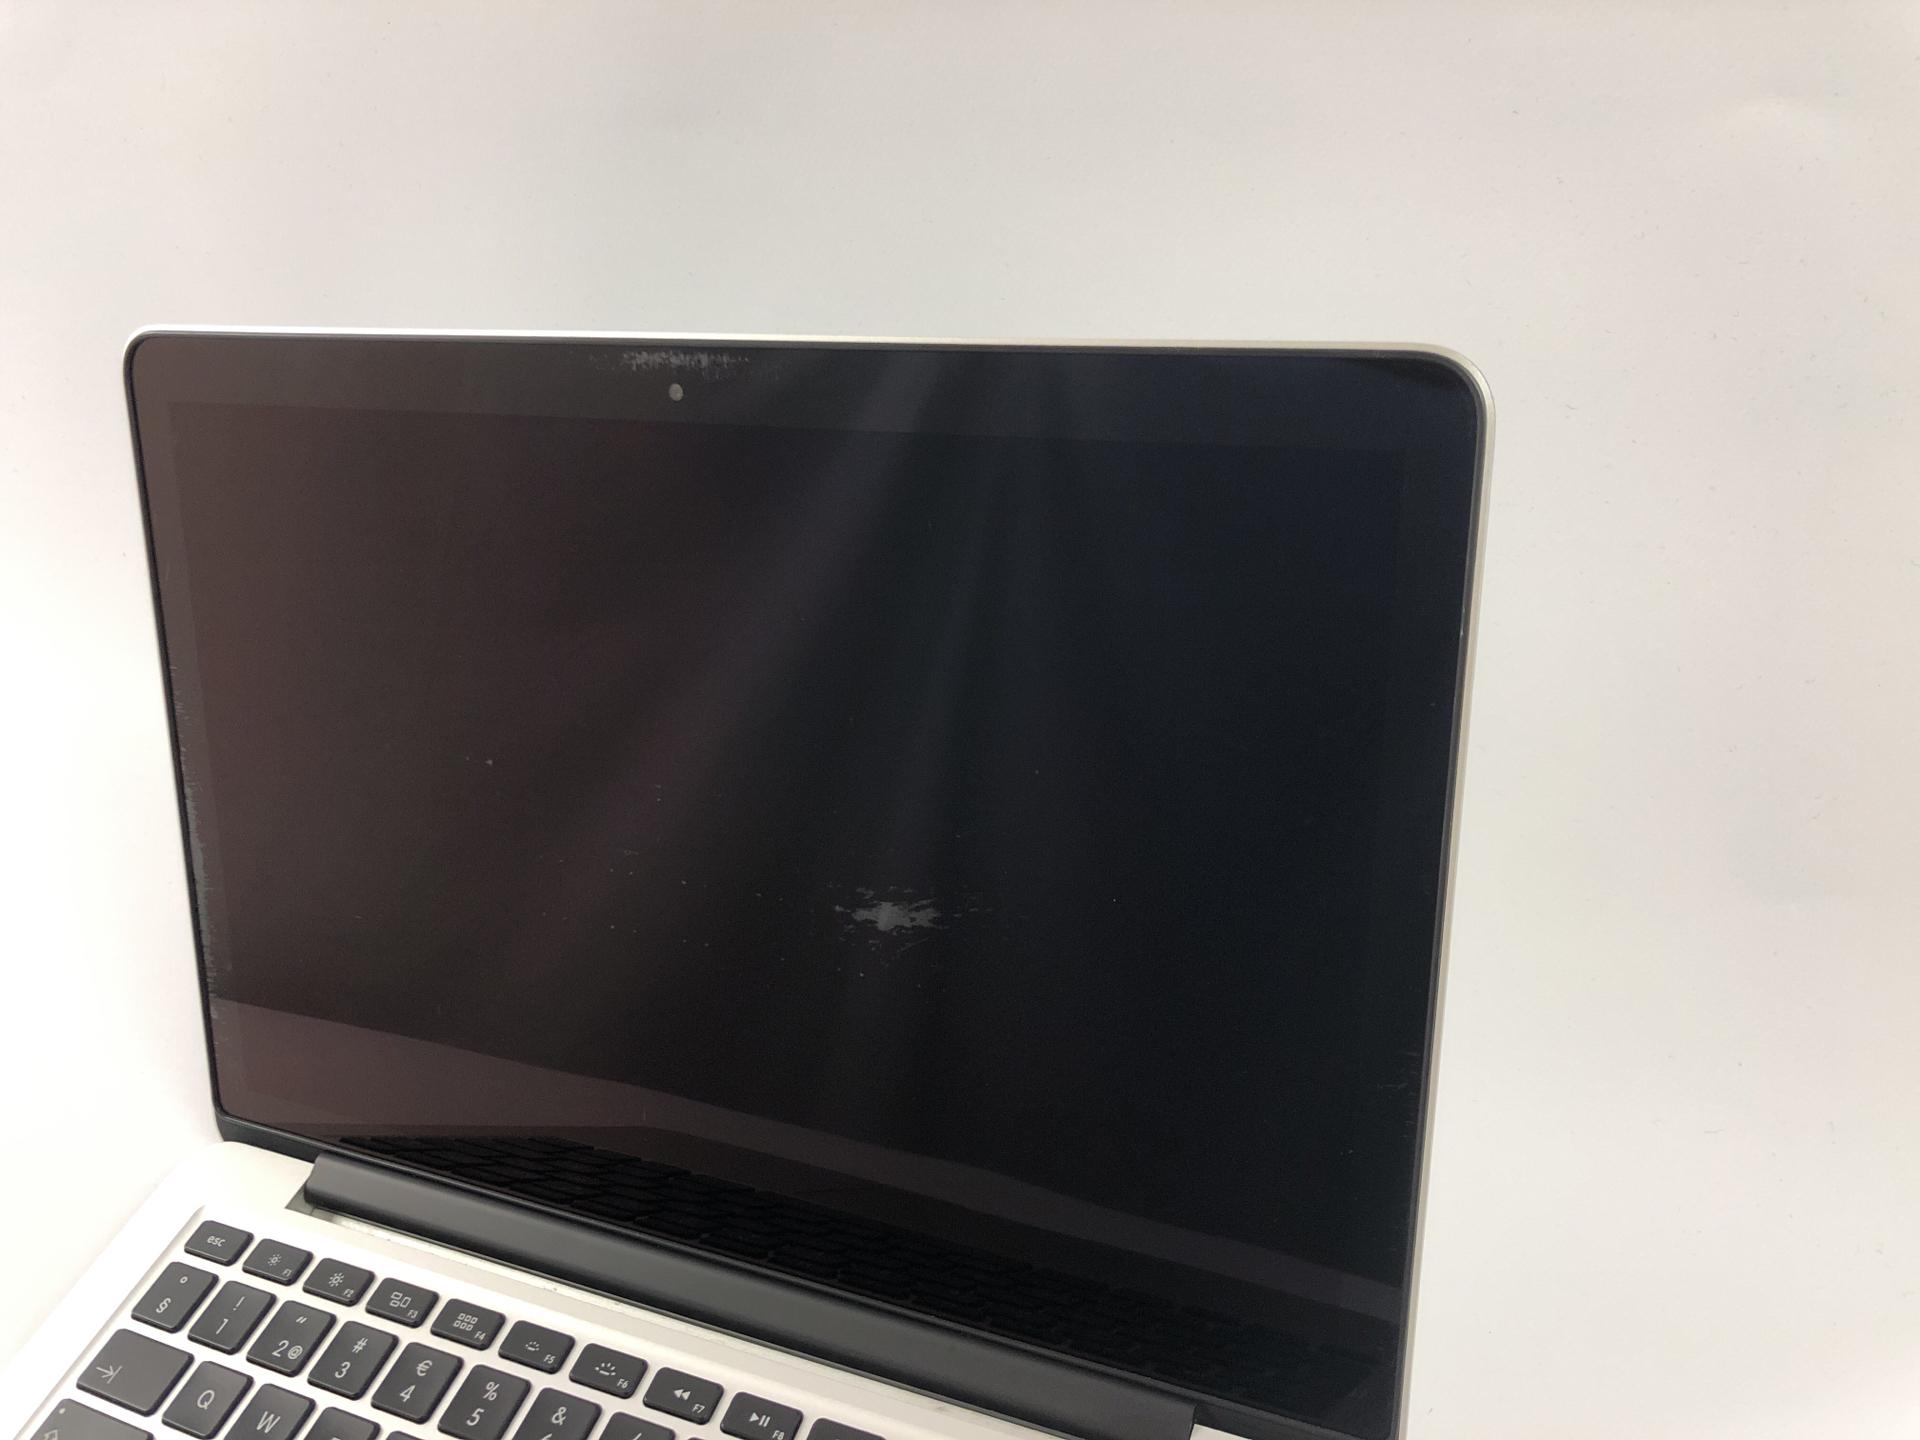 "MacBook Pro Retina 13"" Mid 2014 (Intel Core i7 3.0 GHz 16 GB RAM 256 GB SSD), Intel Core i7 3.0 GHz, 16 GB RAM, 256 GB SSD, bild 4"